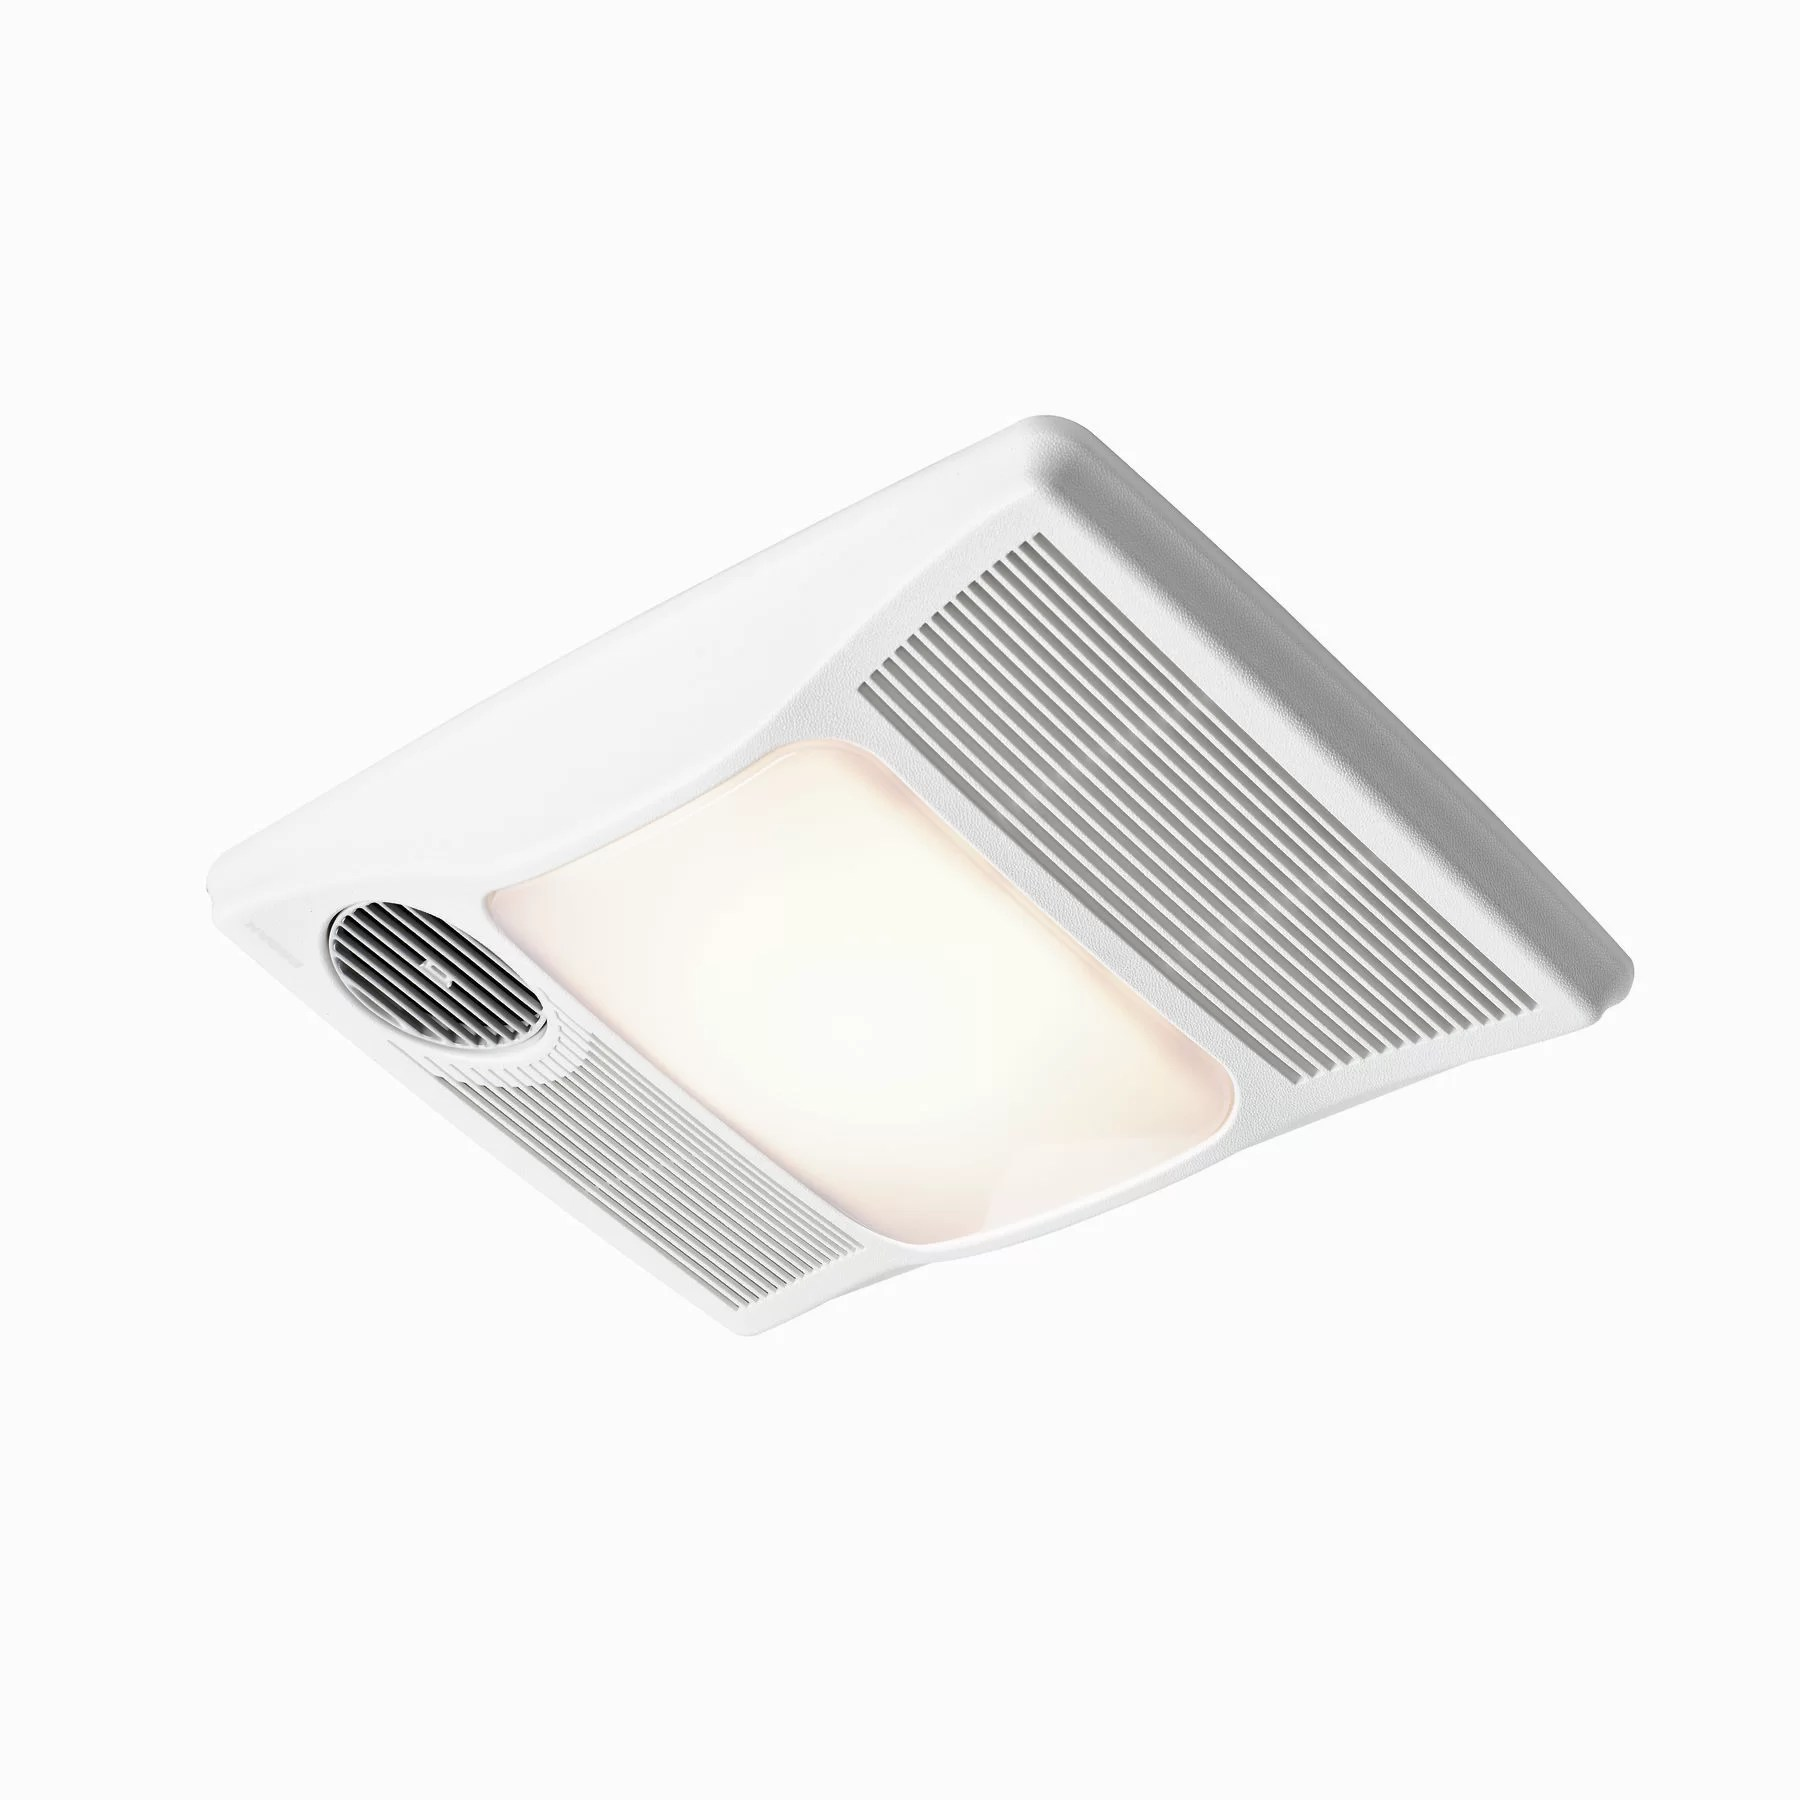 Broan 100 CFM Bathroom Fan with Heater and Light  Reviews  Wayfair